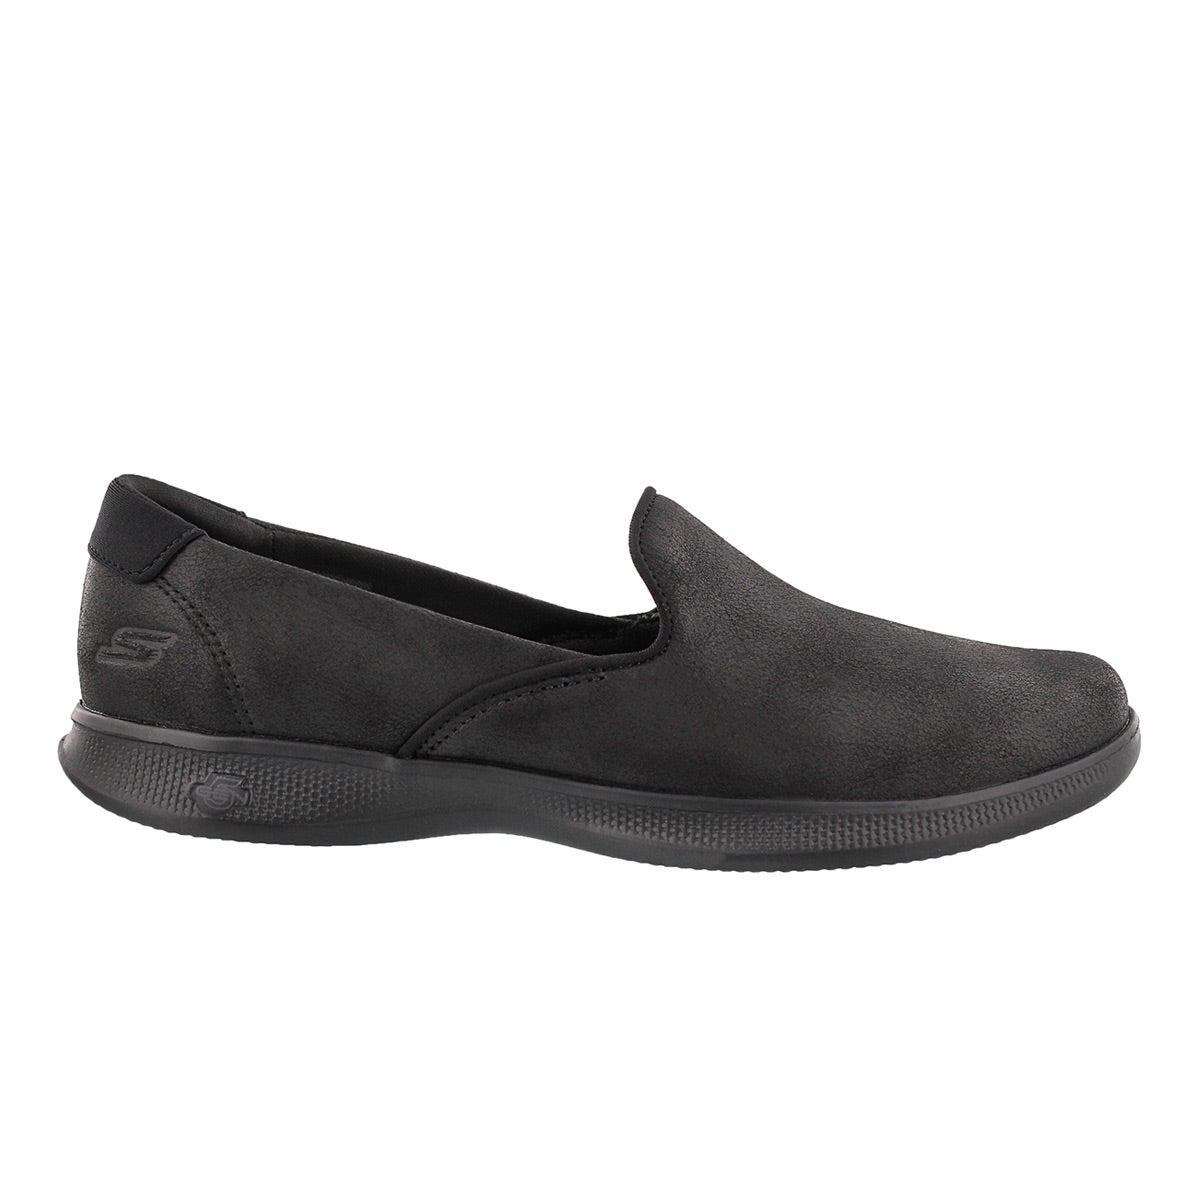 Lds GO Step Lite black casual slip on